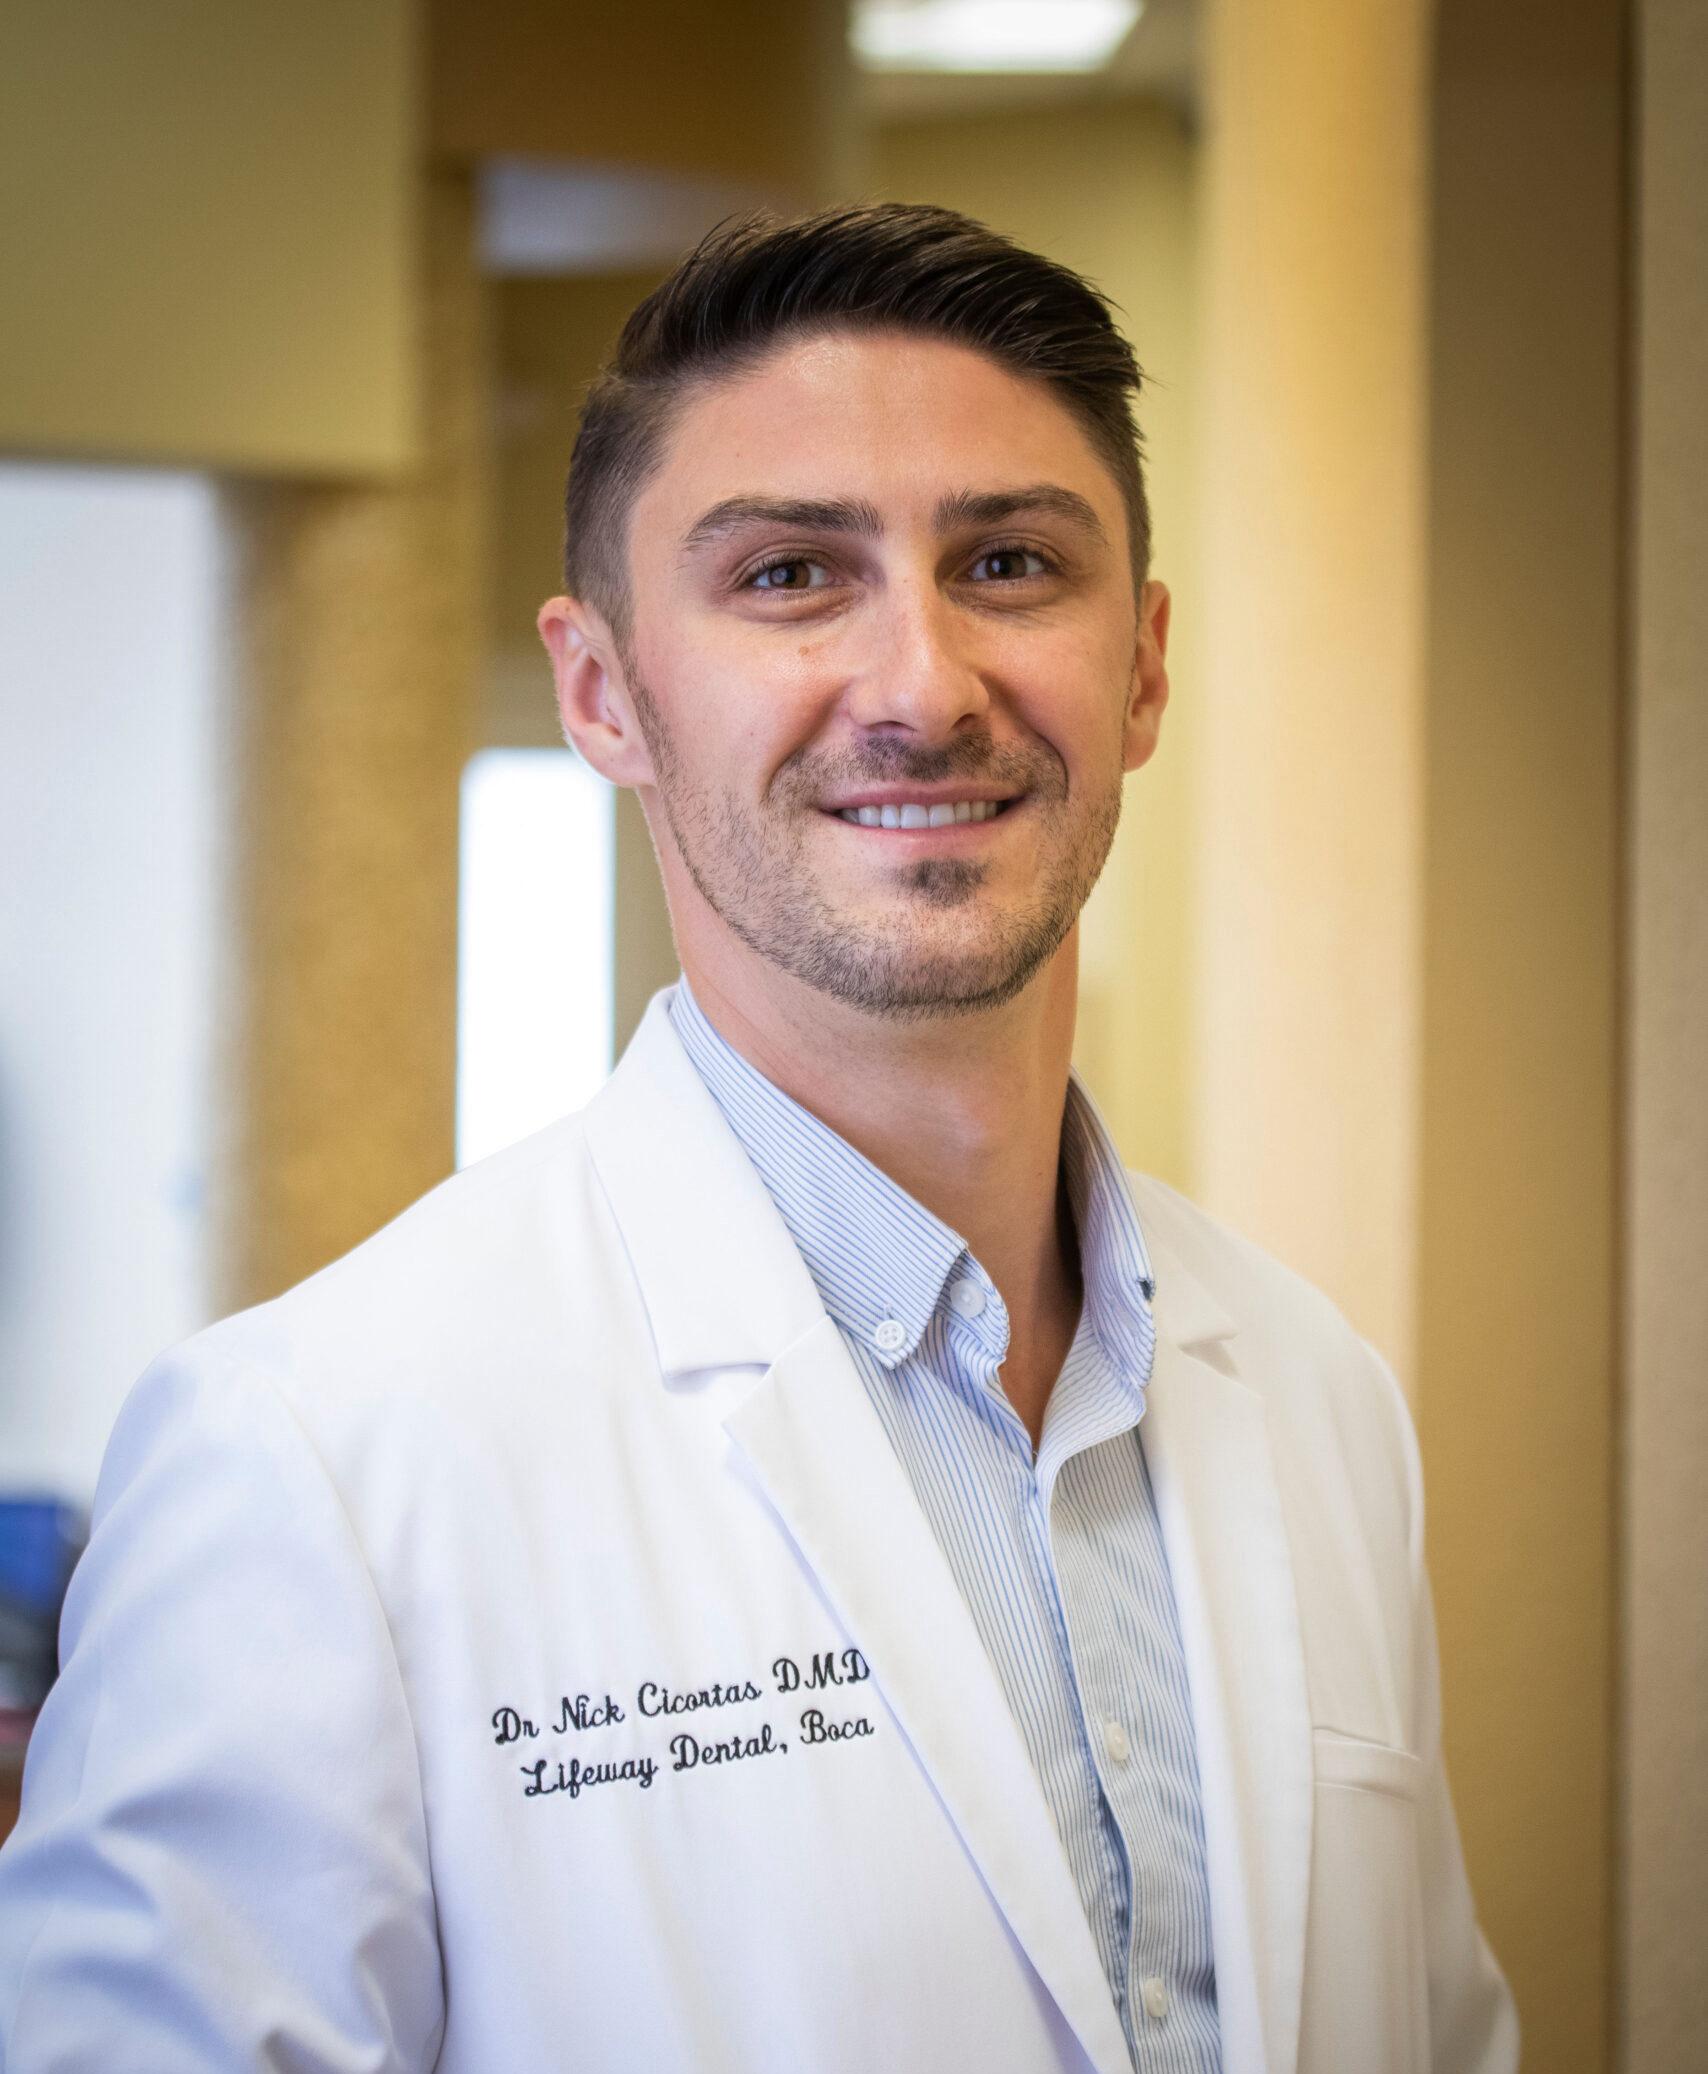 Dr. Nick Cicortas, DMD